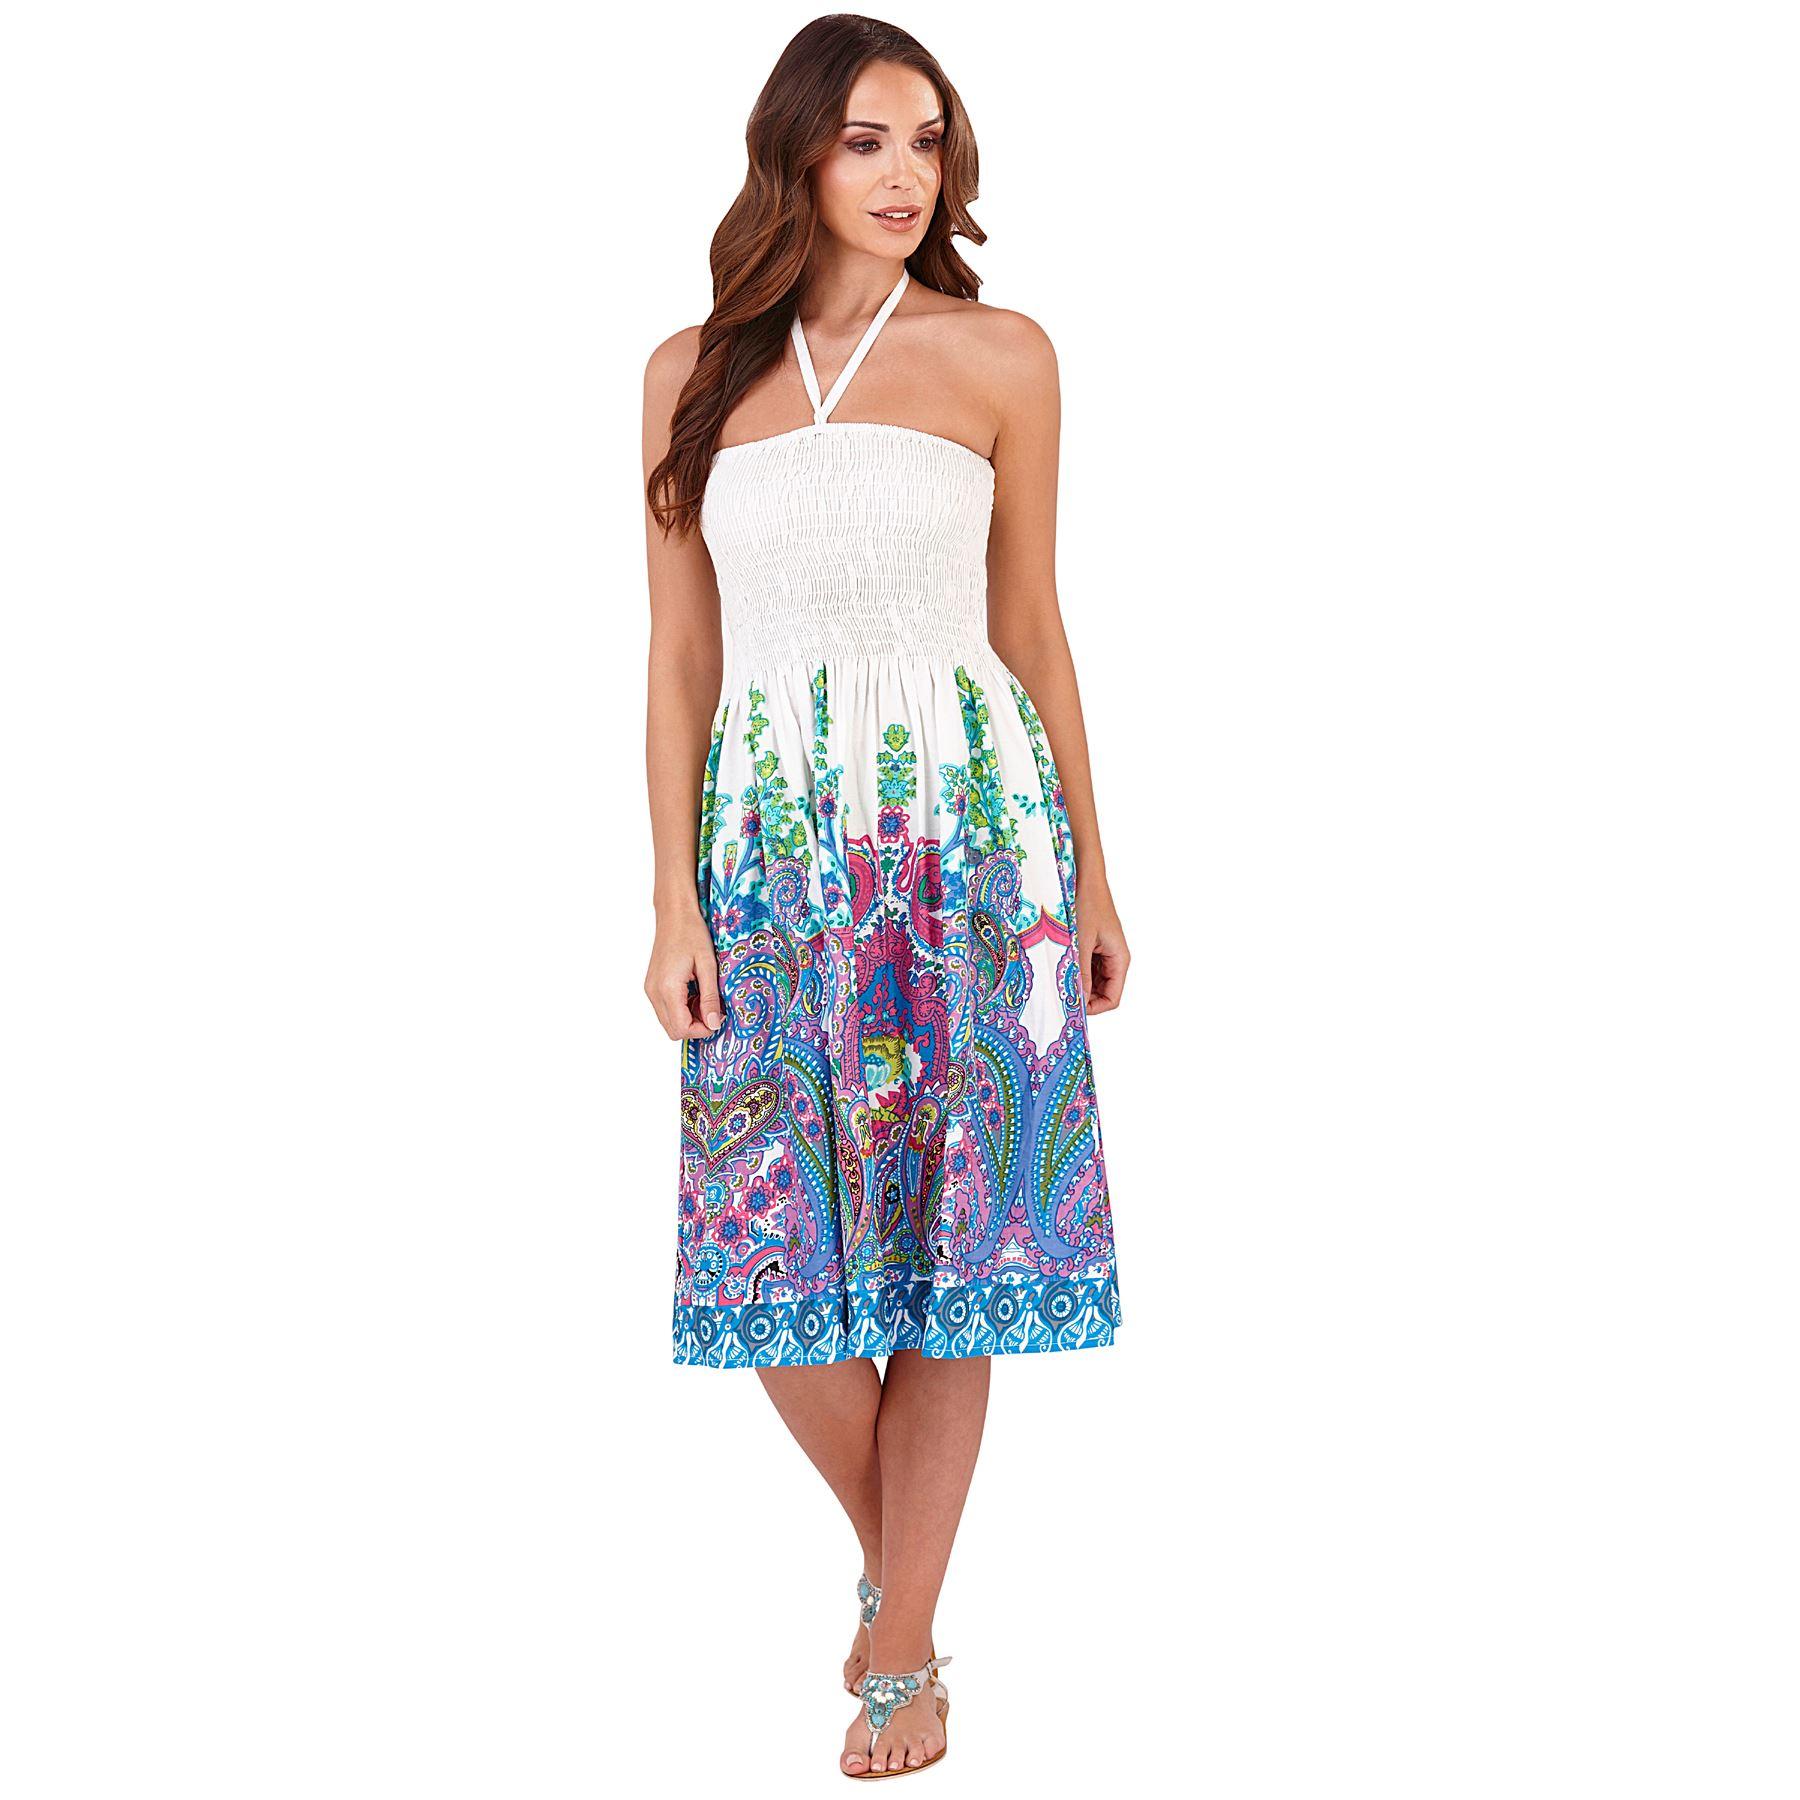 La s Summer Beach Cotton 3 in 1 Bandeau Strapless Sun Dress Skirt